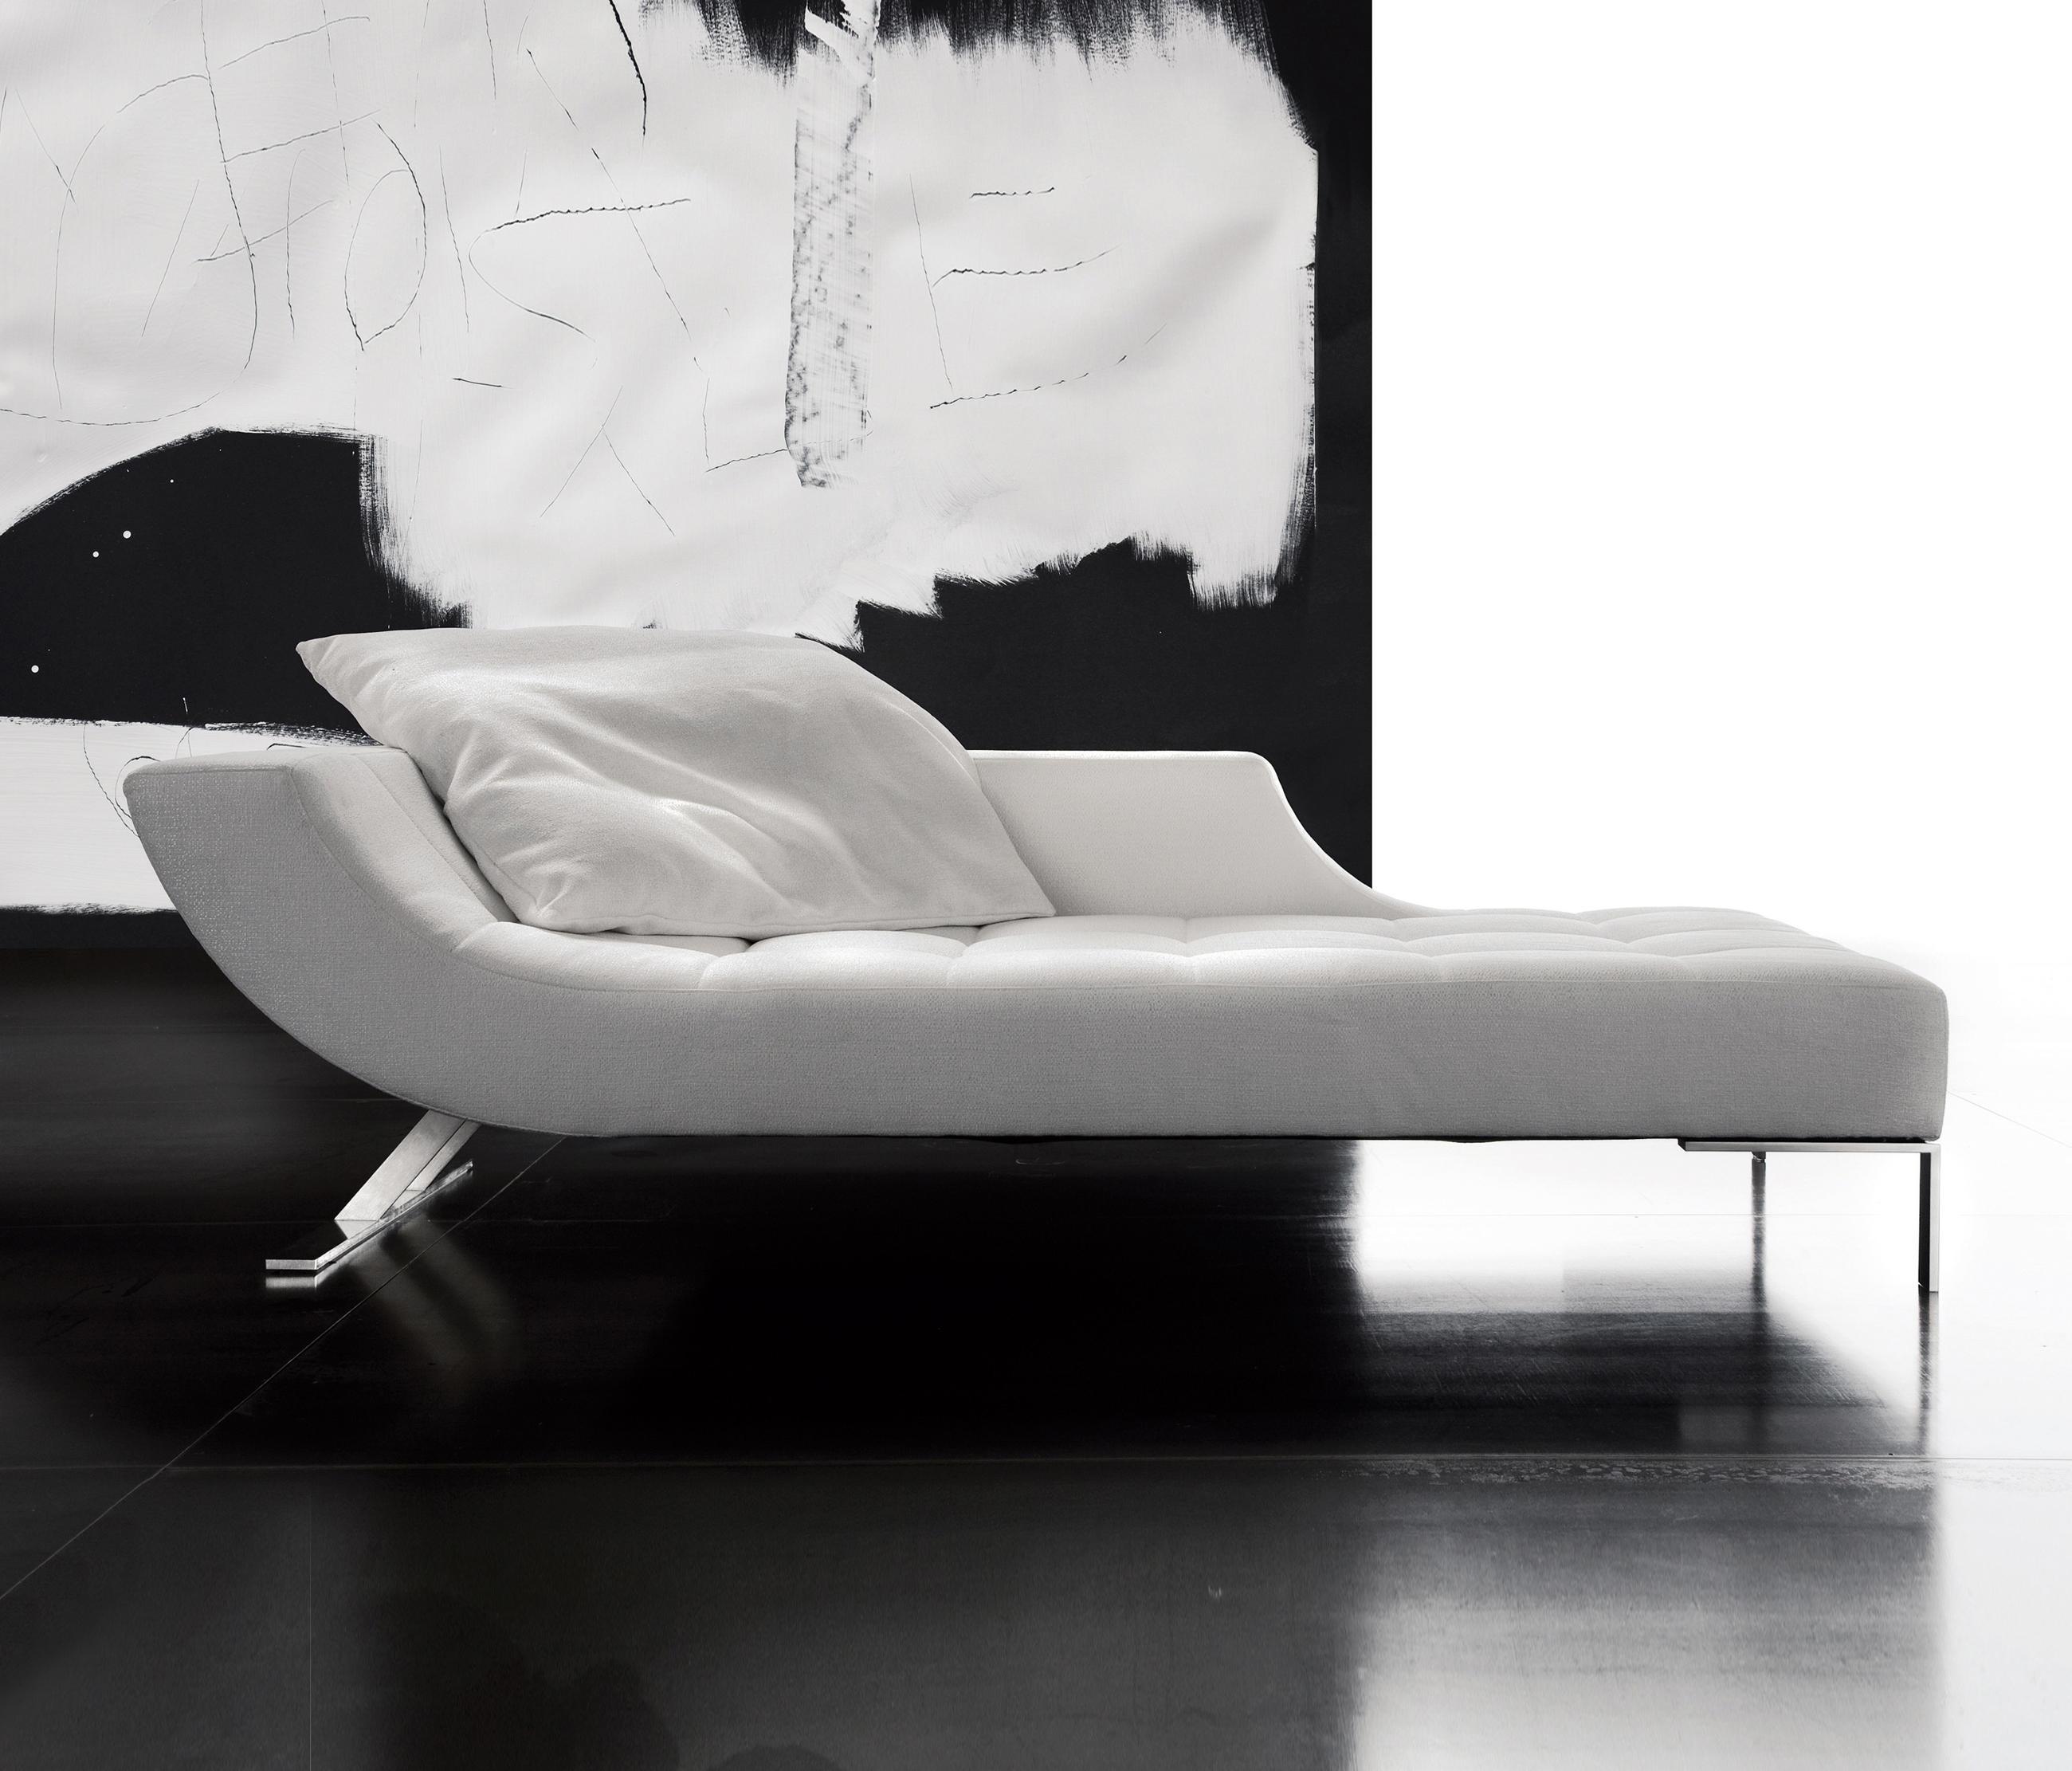 Viceversa chaise longue chaise longues von erba italia for Des chaises longues